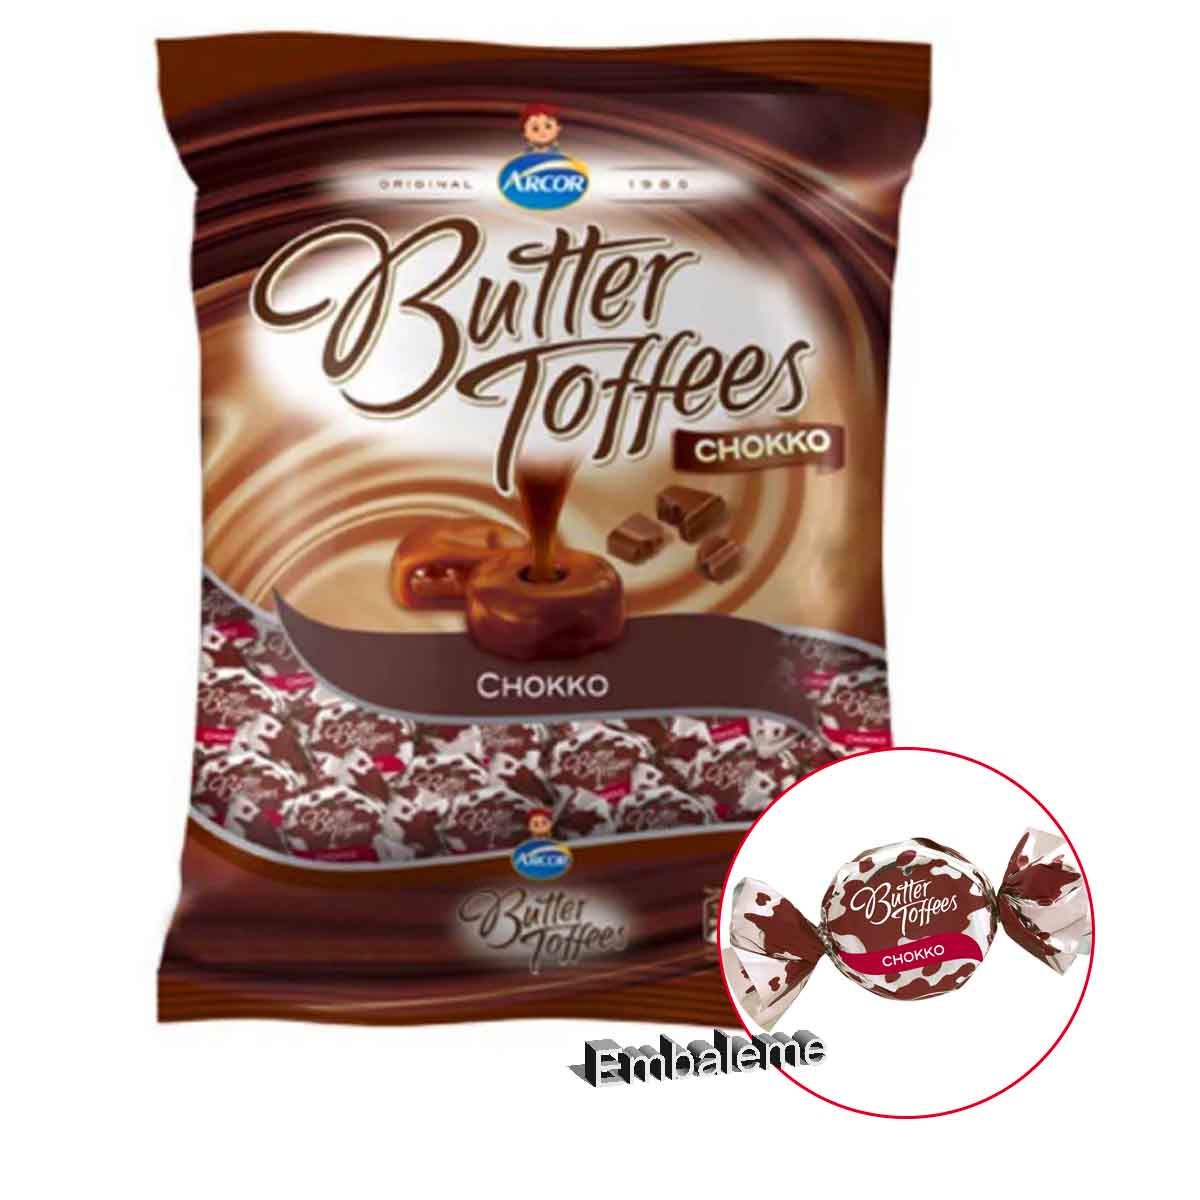 Bala Butter Toffees Chokko 500G Arcor